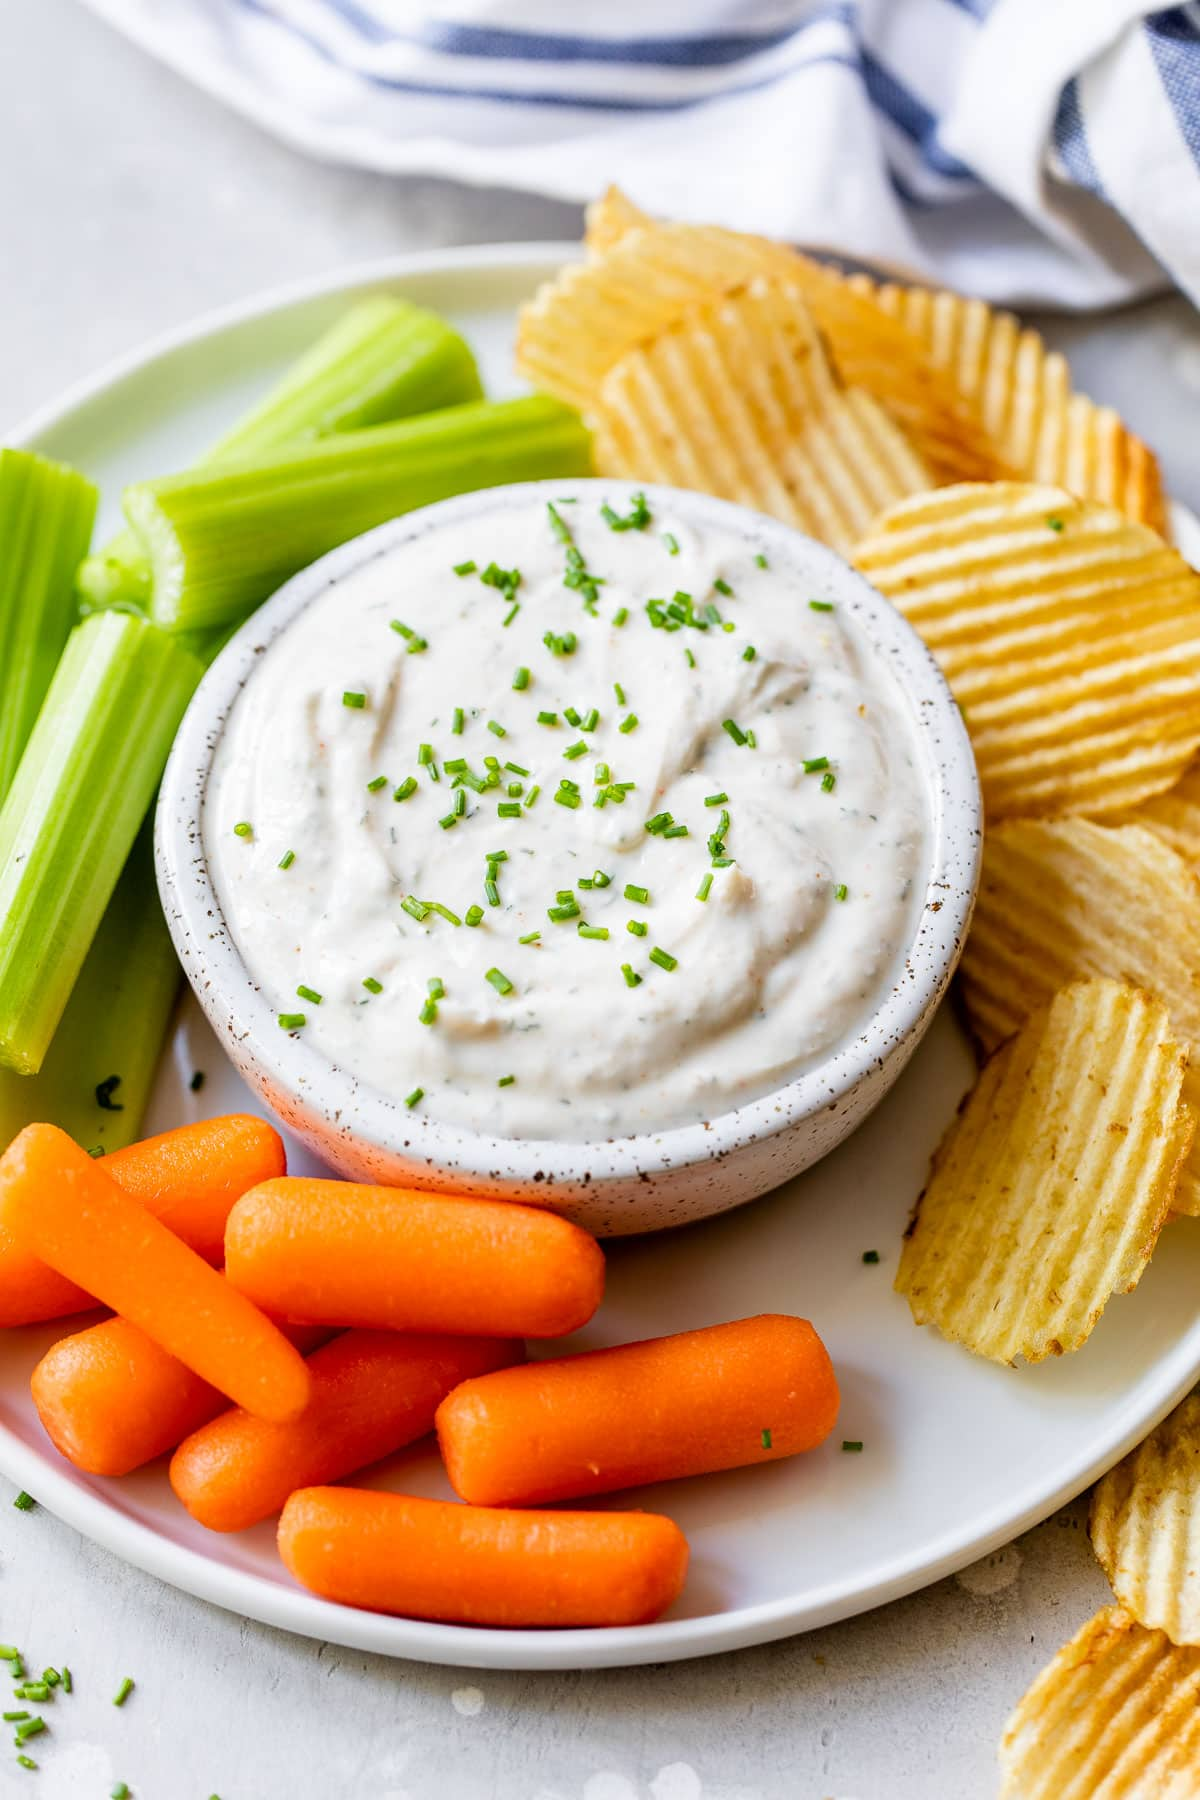 Skinny Ranch Dip made with Greek yogurt